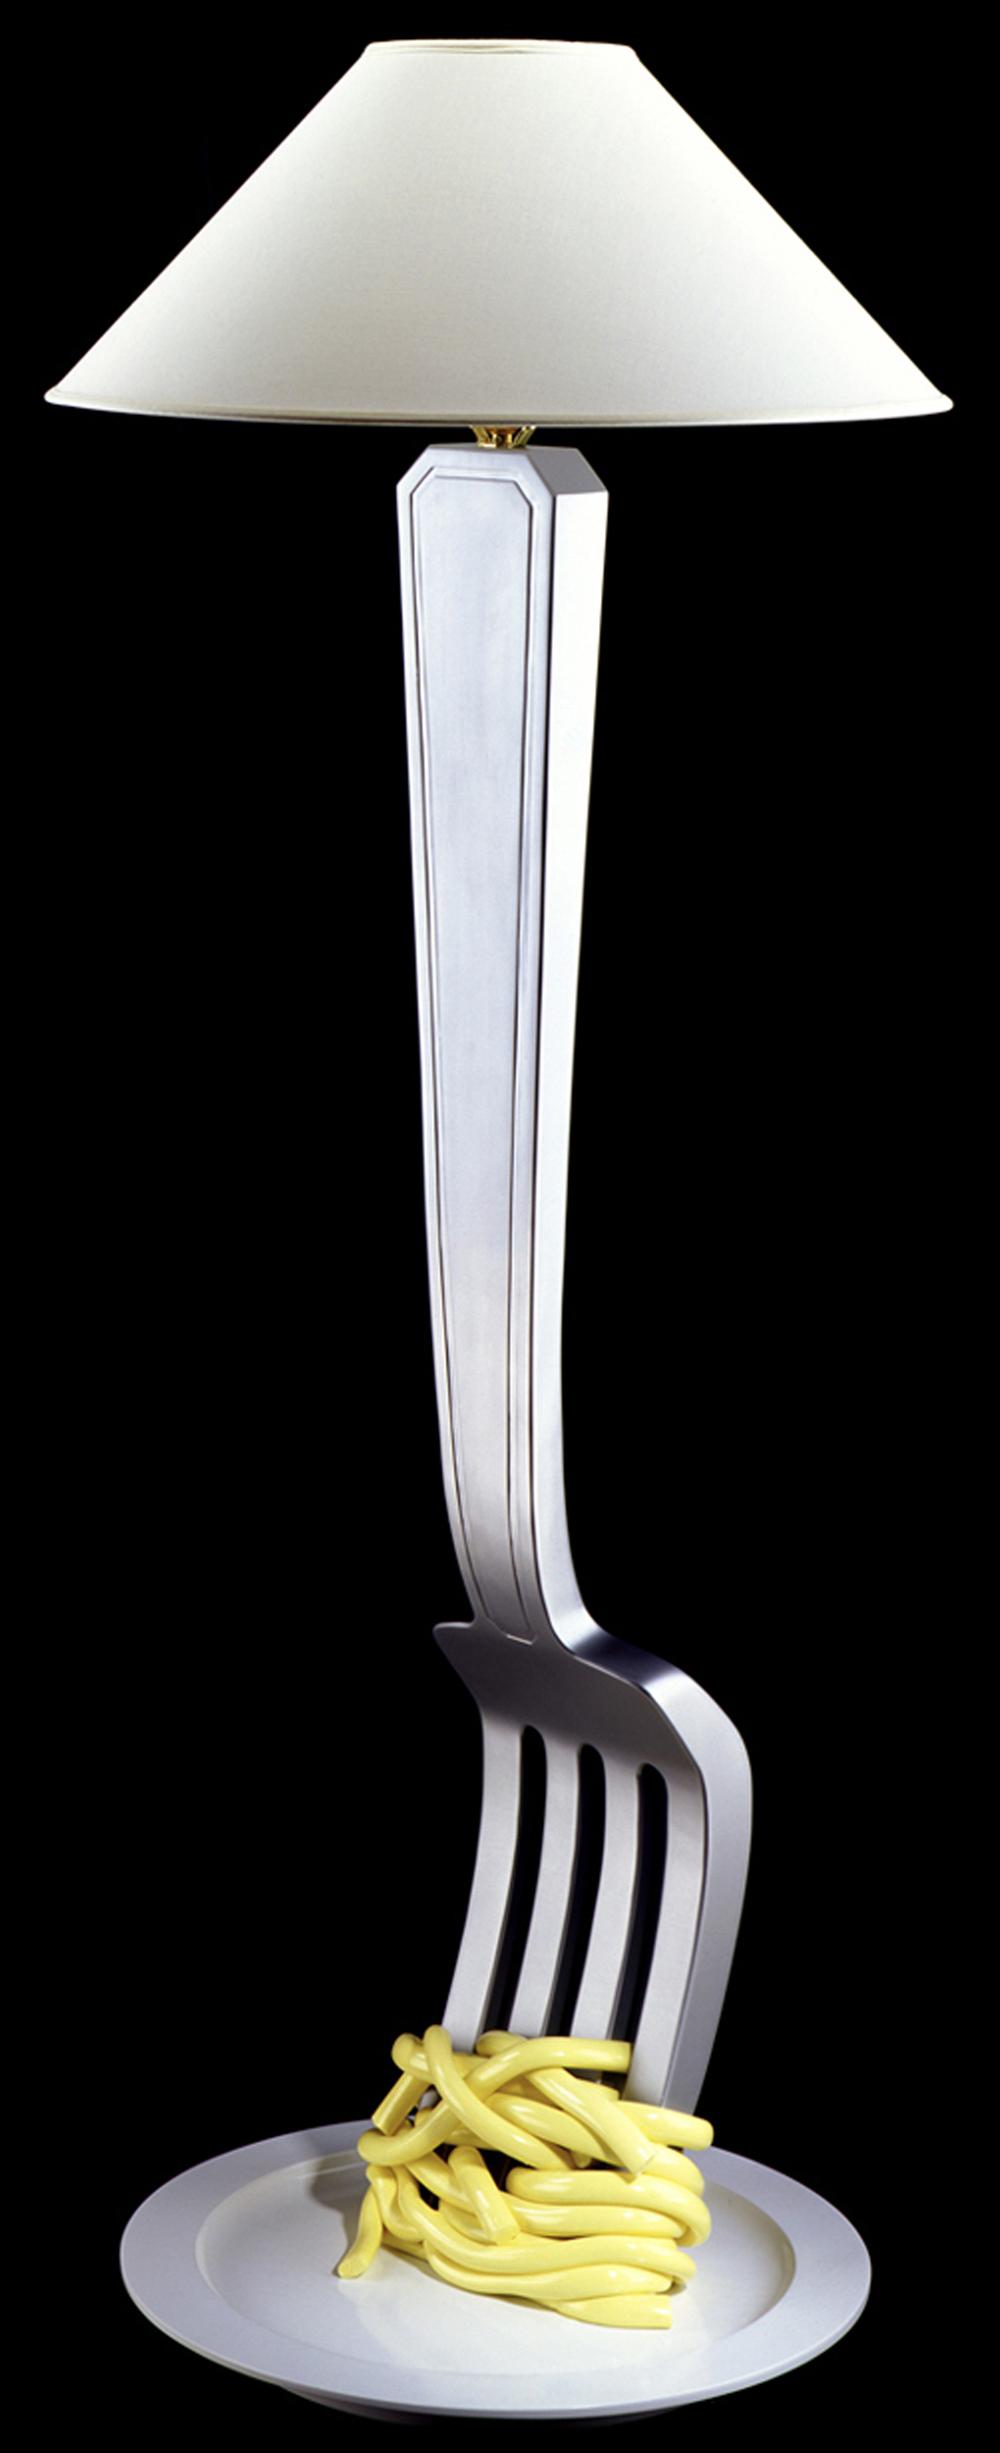 Spaghetti Fork Lamp, 2003, 60 H (Sold)